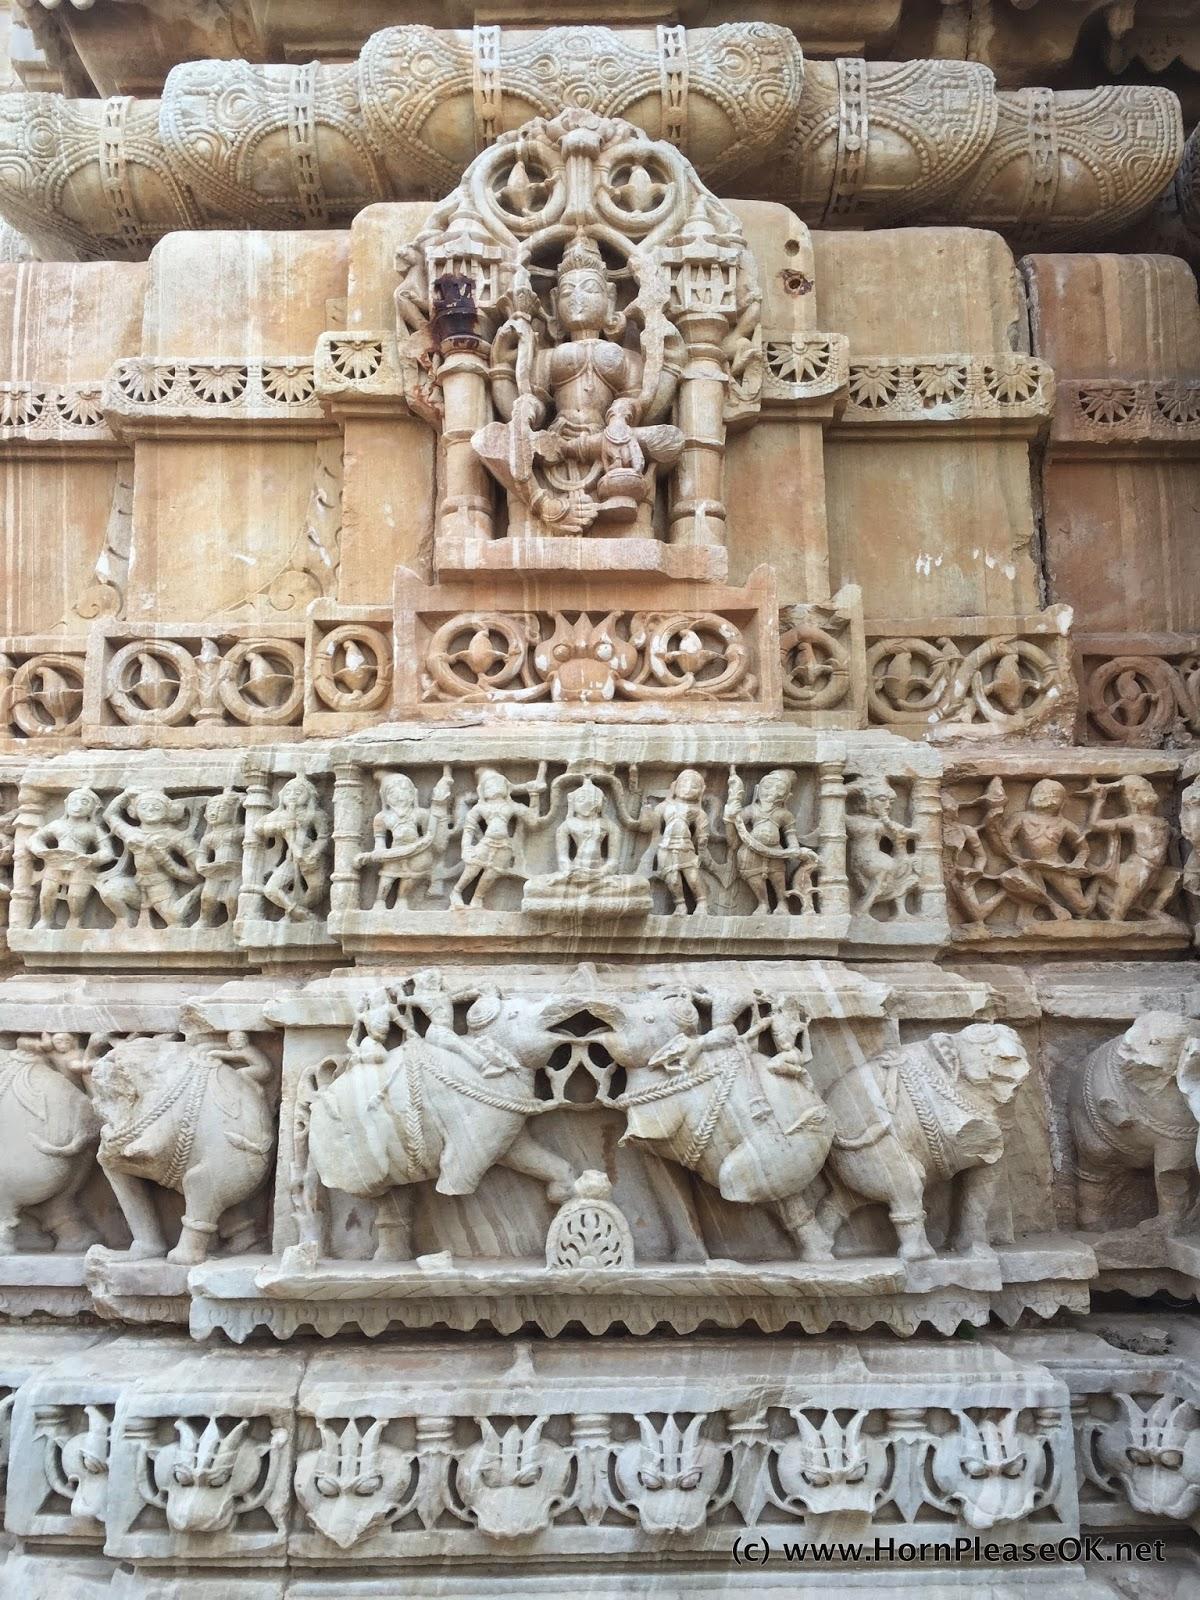 Defaced Jain Temple inside Chittorgarh Fort